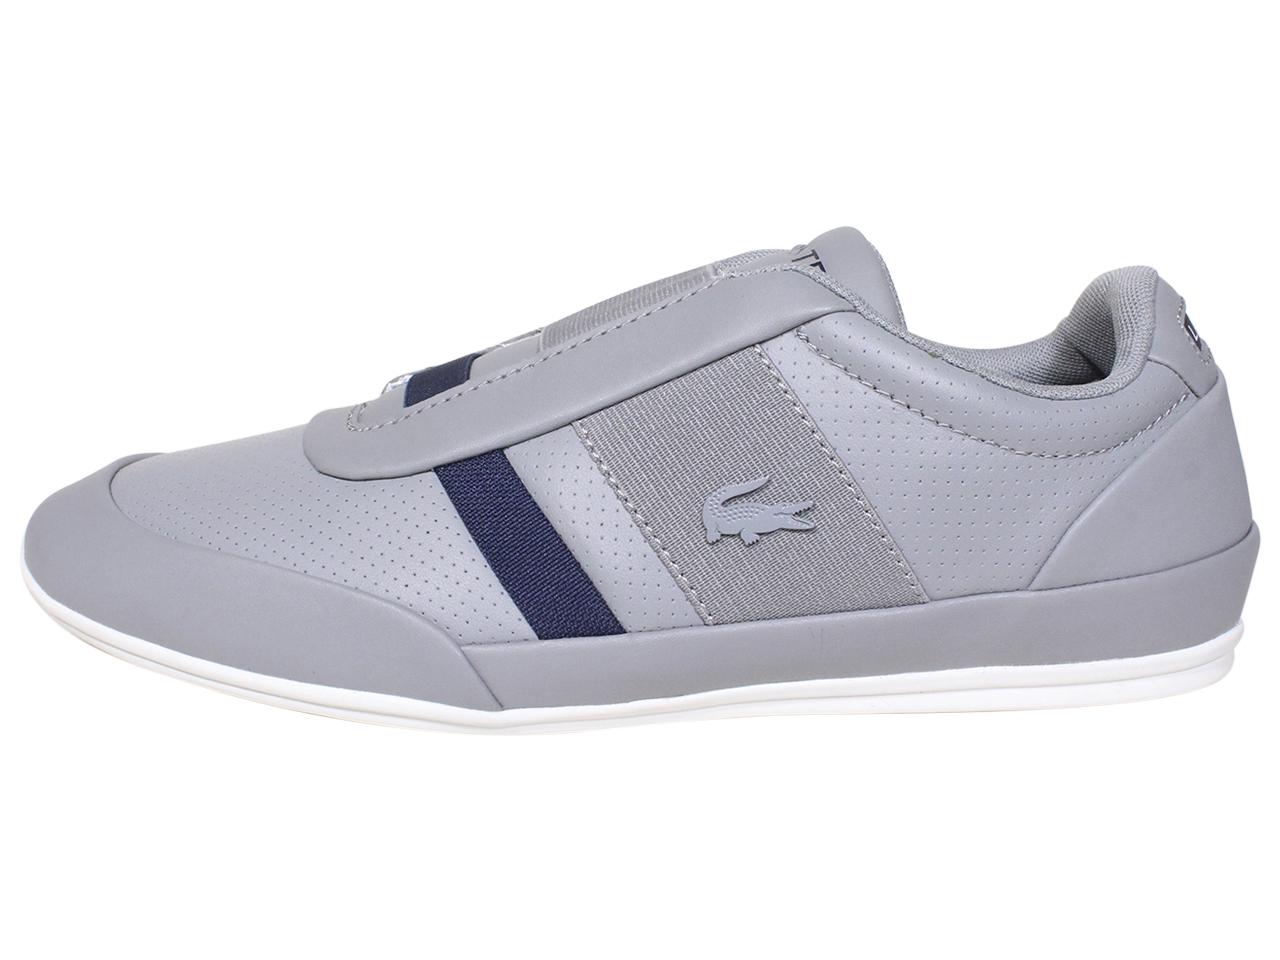 Lacoste-Misano-Elastic-318-Sneakers-Men-039-s-Low-Top-Shoes thumbnail 10